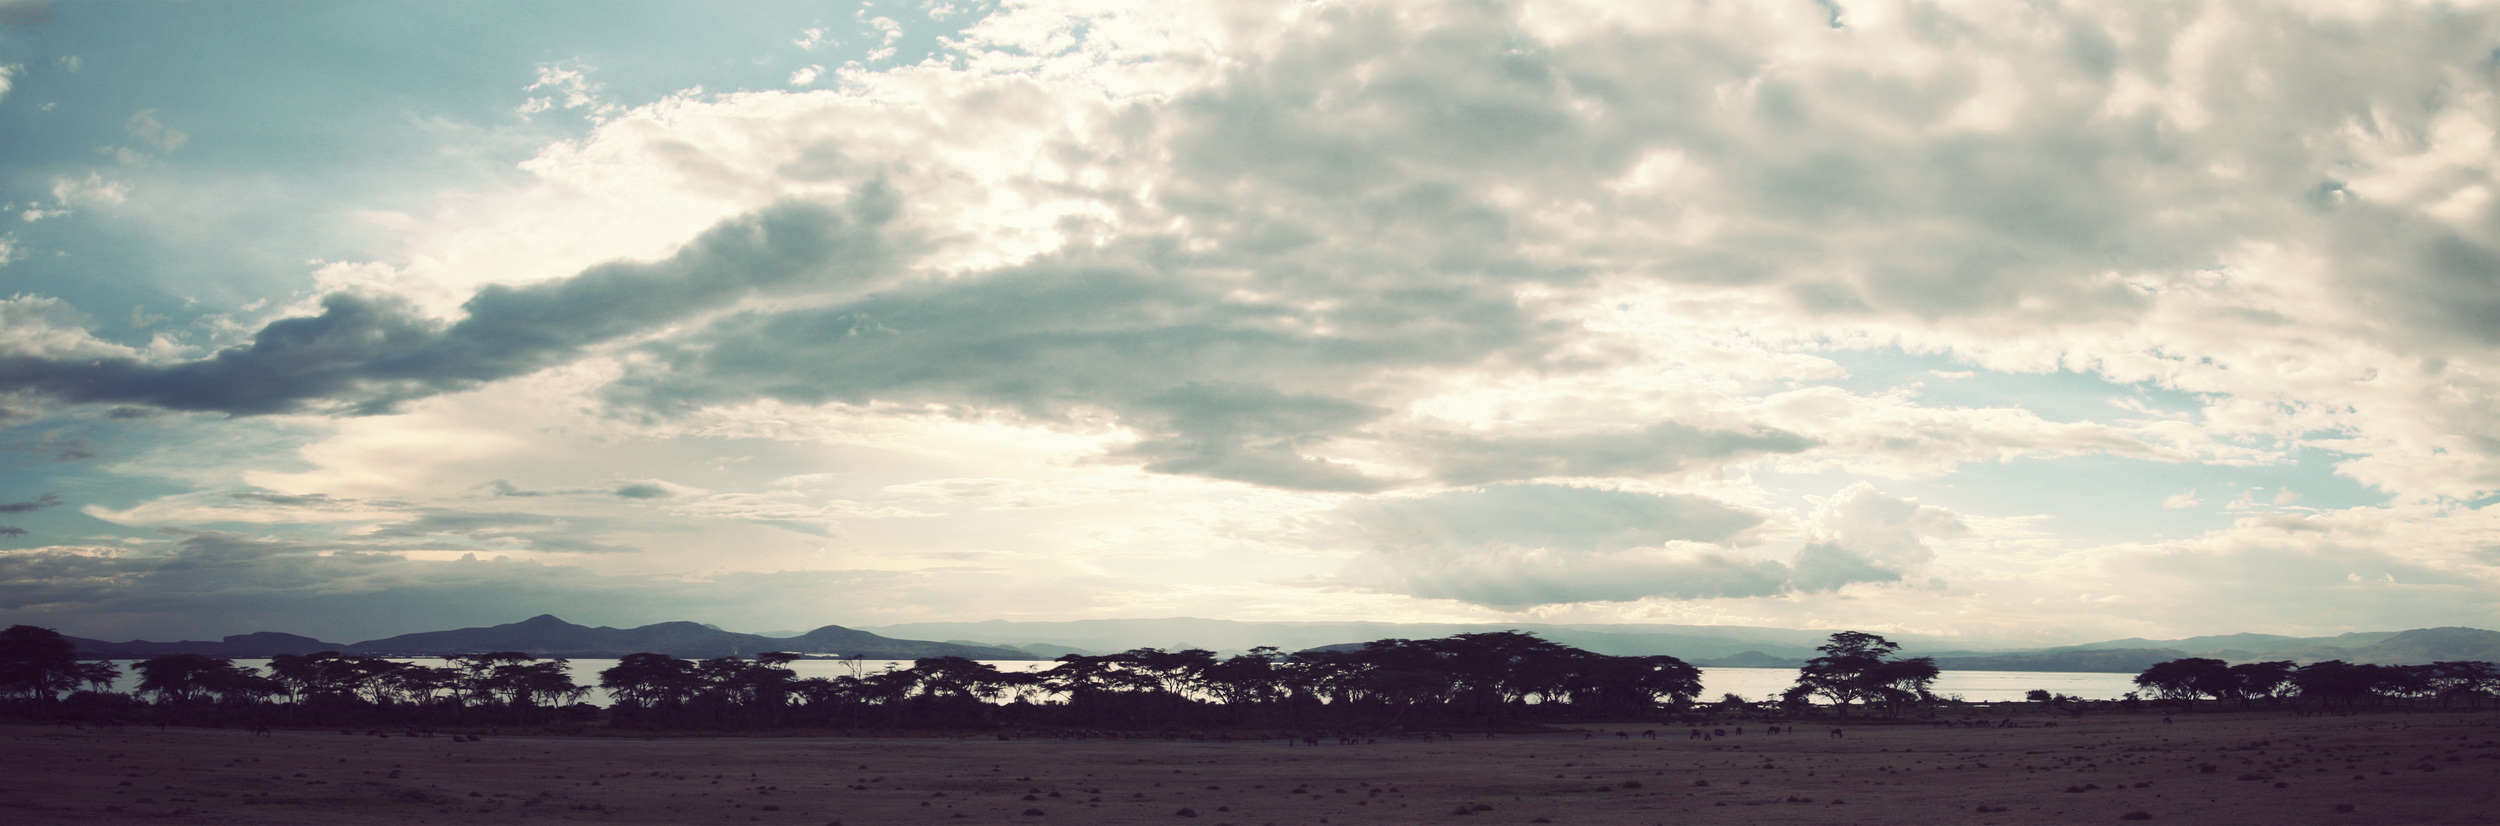 Day03_SOPA_Walking-Safari_Rift-Valley-Panorama.jpg